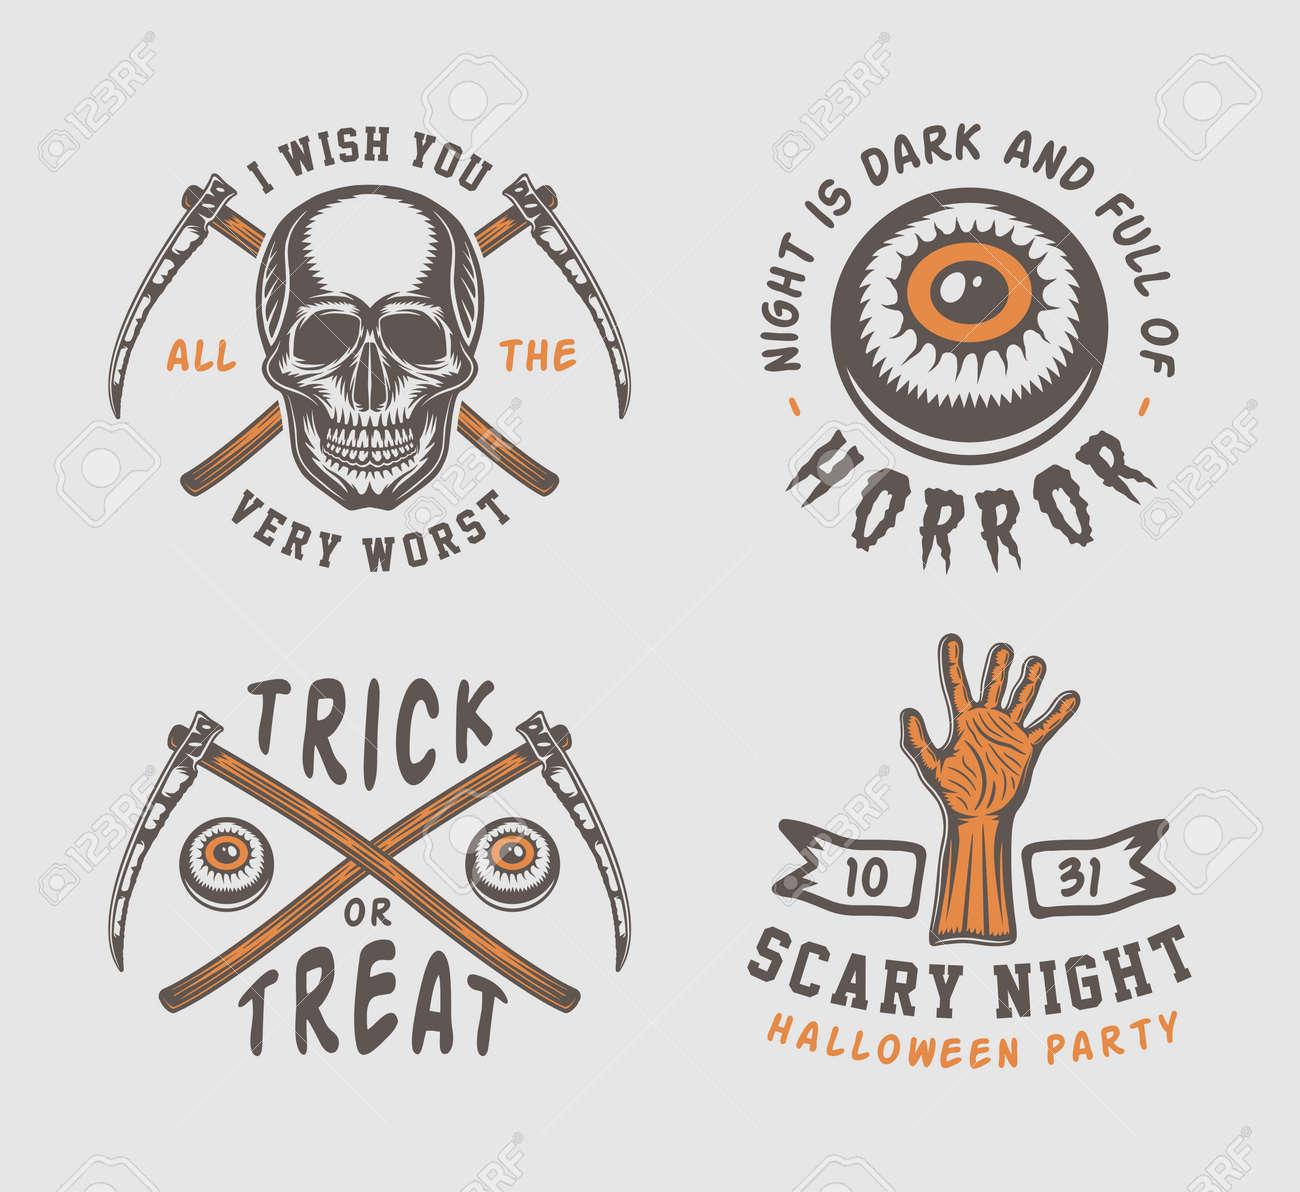 Retro Vintage Halloween Clip Art.Vintage Retro Halloween Logos Emblems Vector Illustration